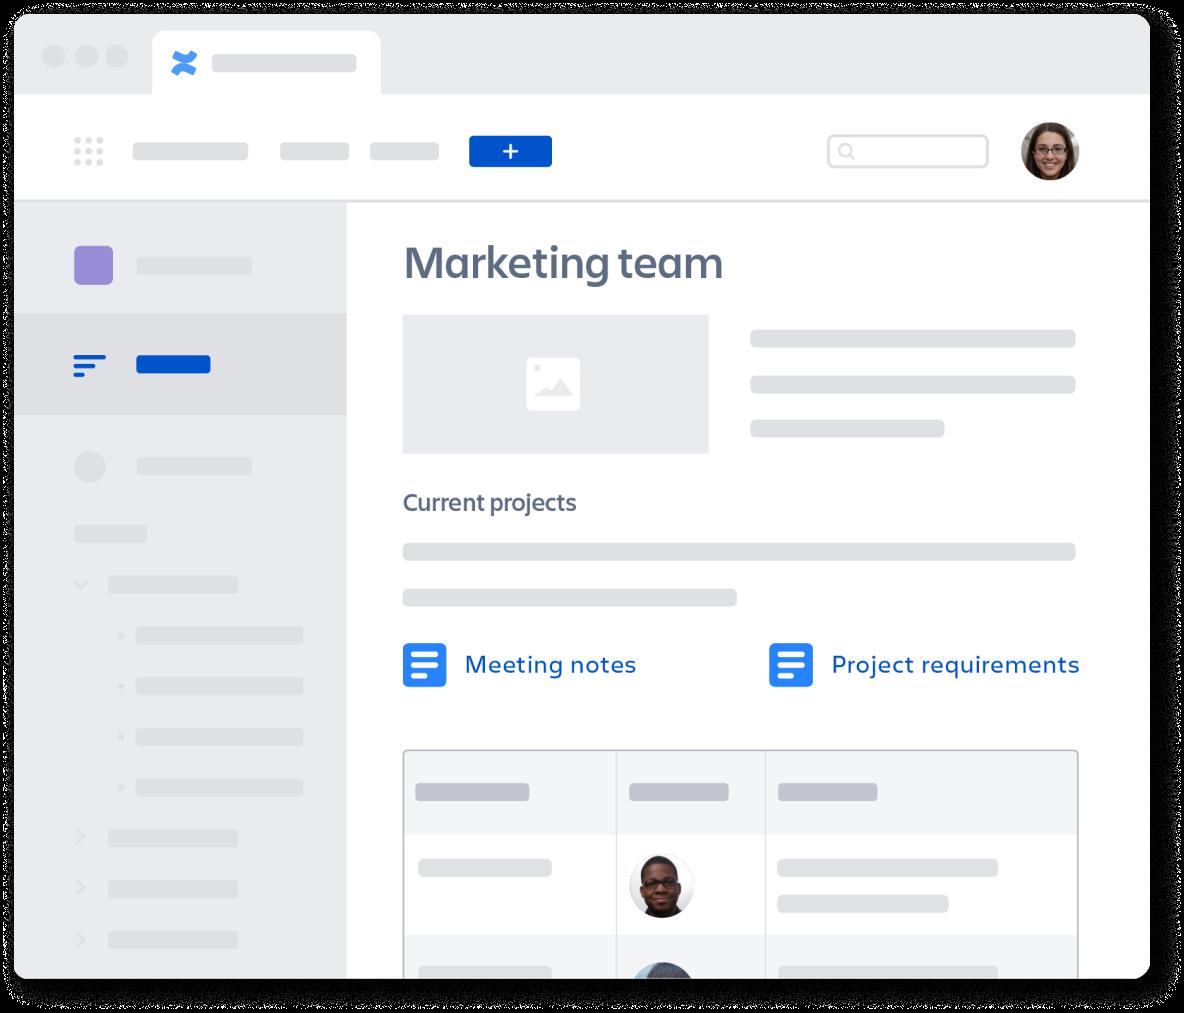 Marketing team page